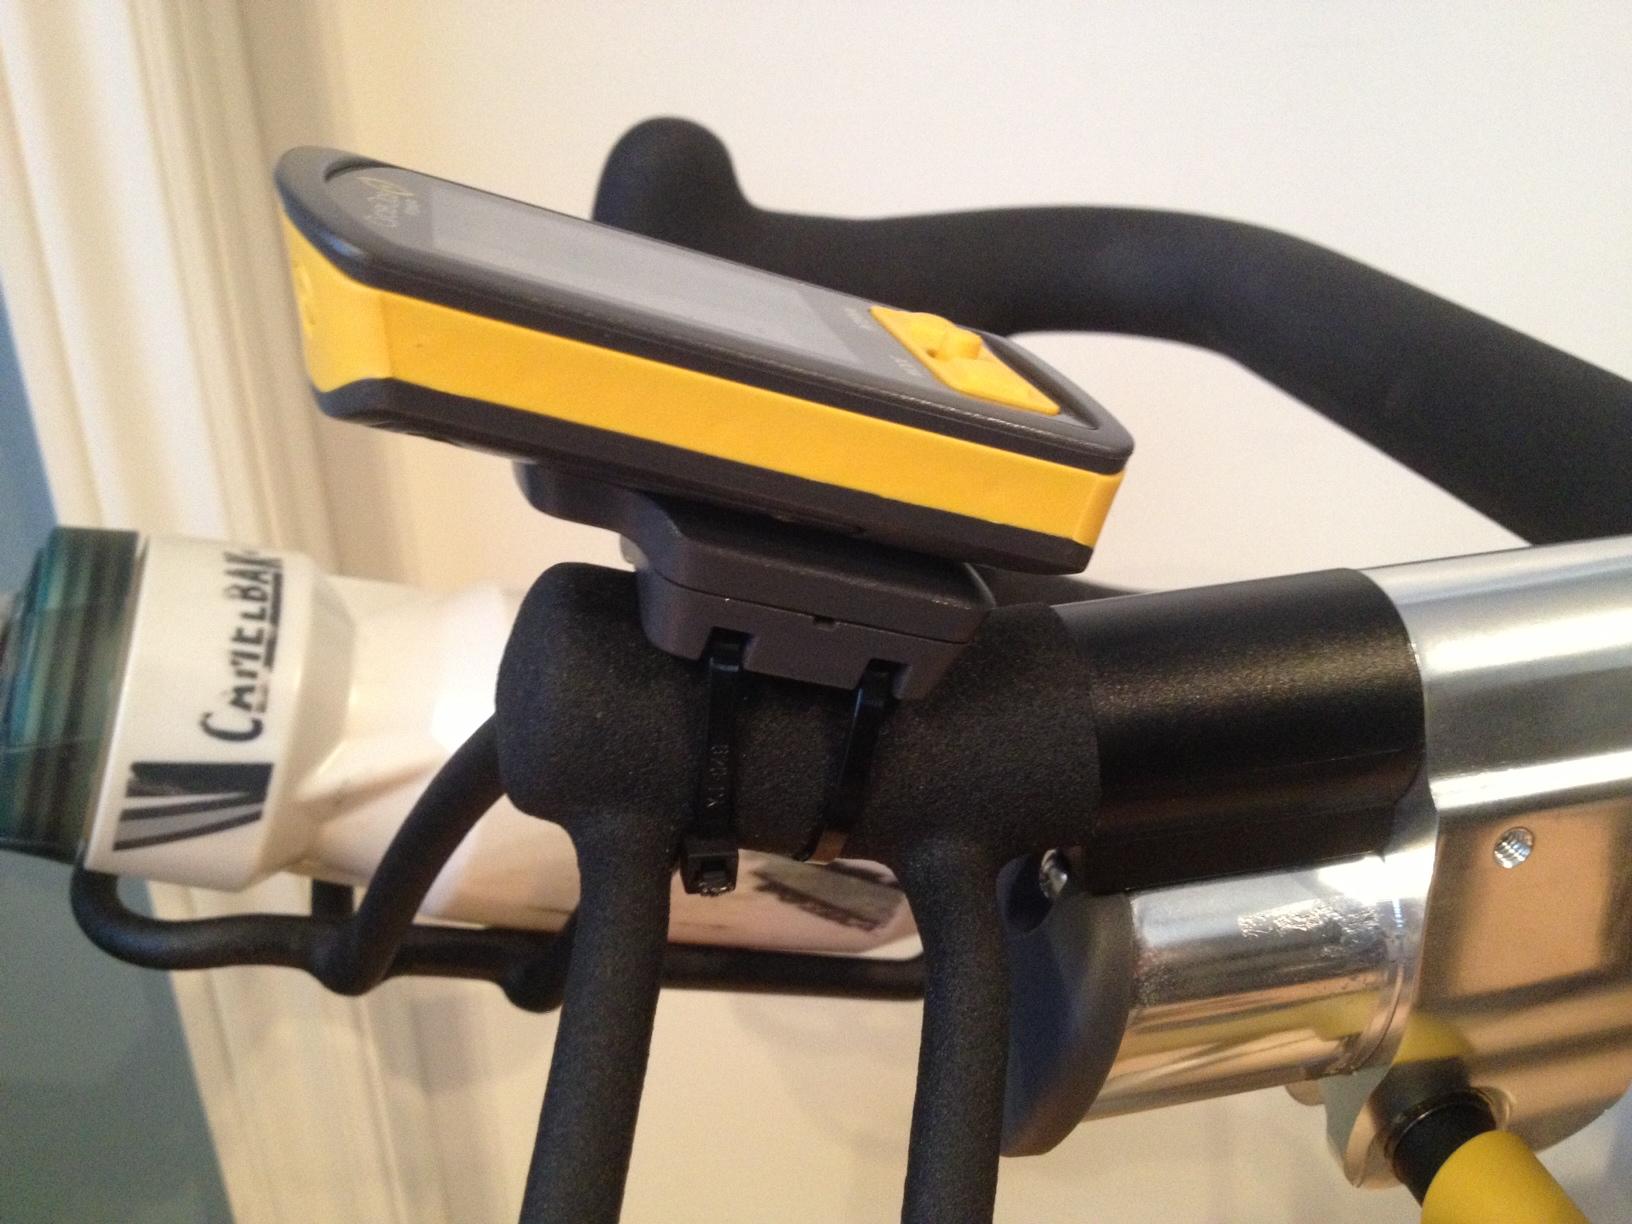 cycleops joule 2.0 manual